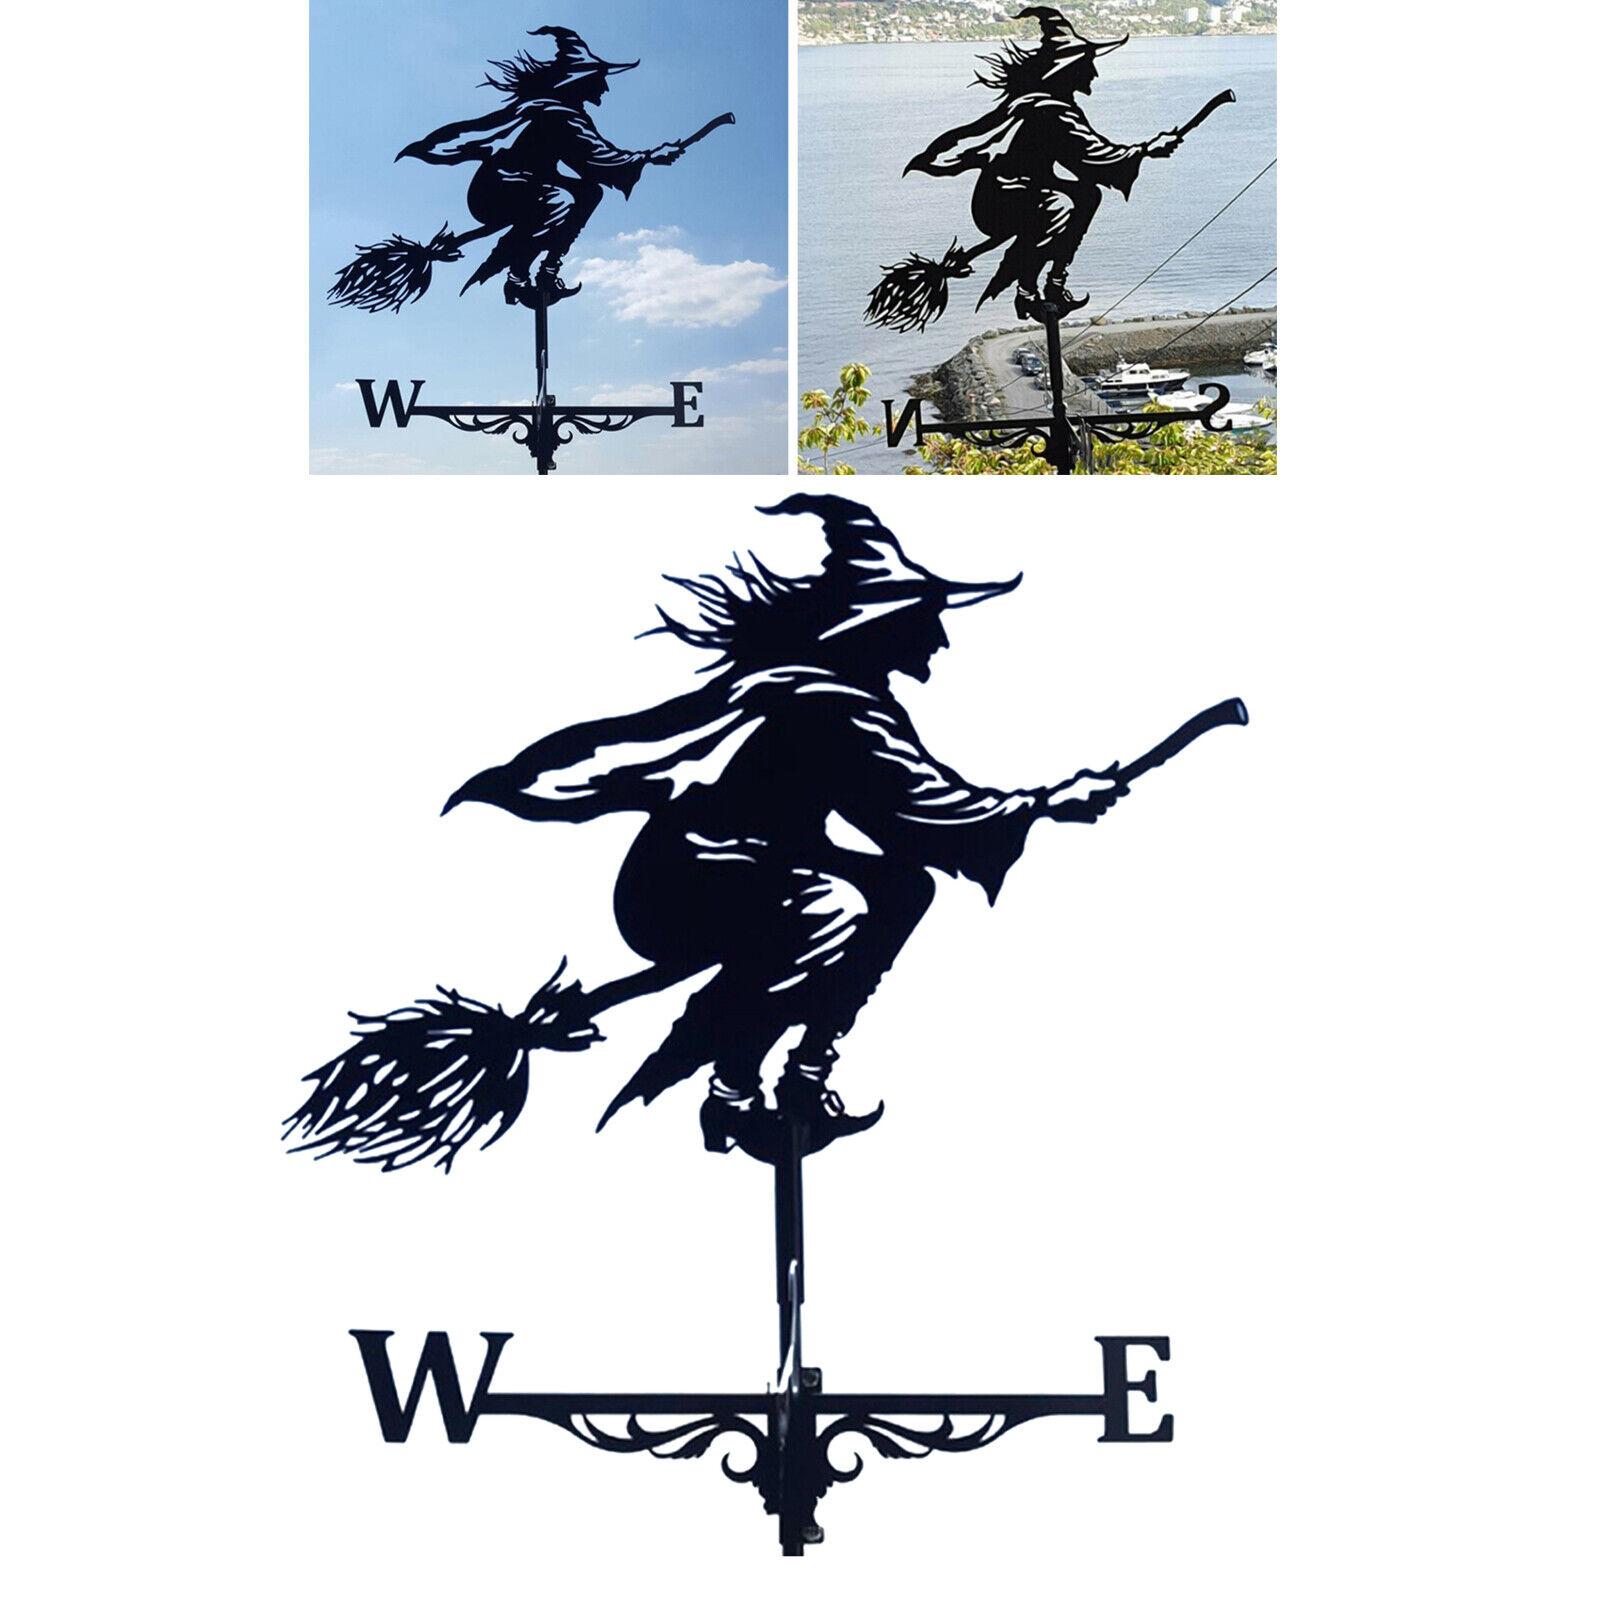 Metal Black Witch Weathervane Outdoor Mount Weather Vane Roof Fence Decor 30''